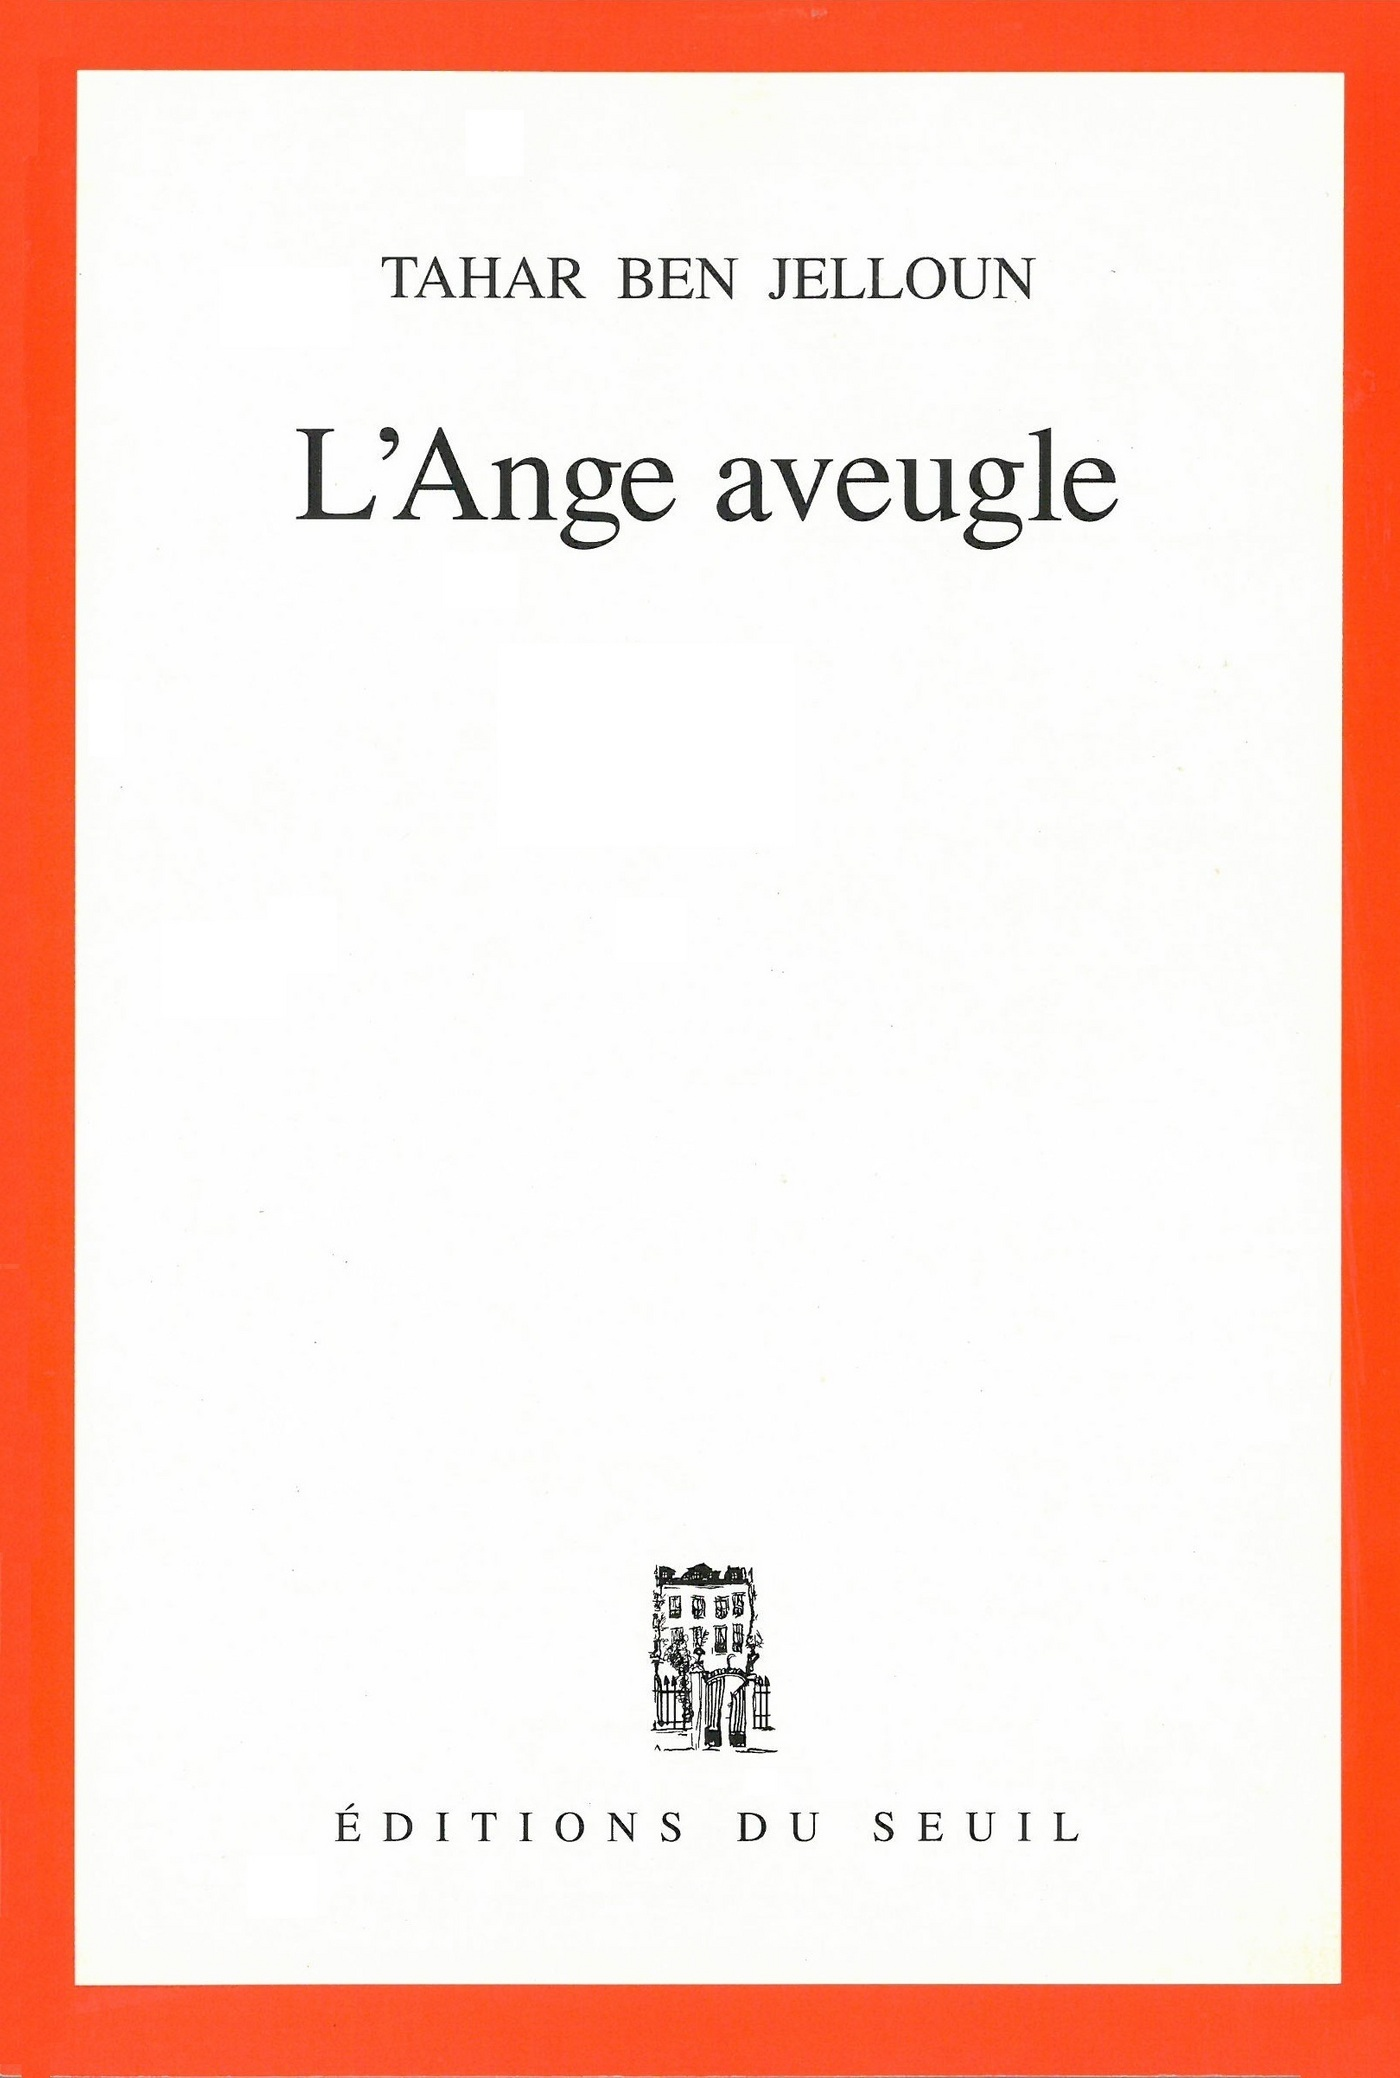 L'Ange aveugle | Ben Jelloun, Tahar